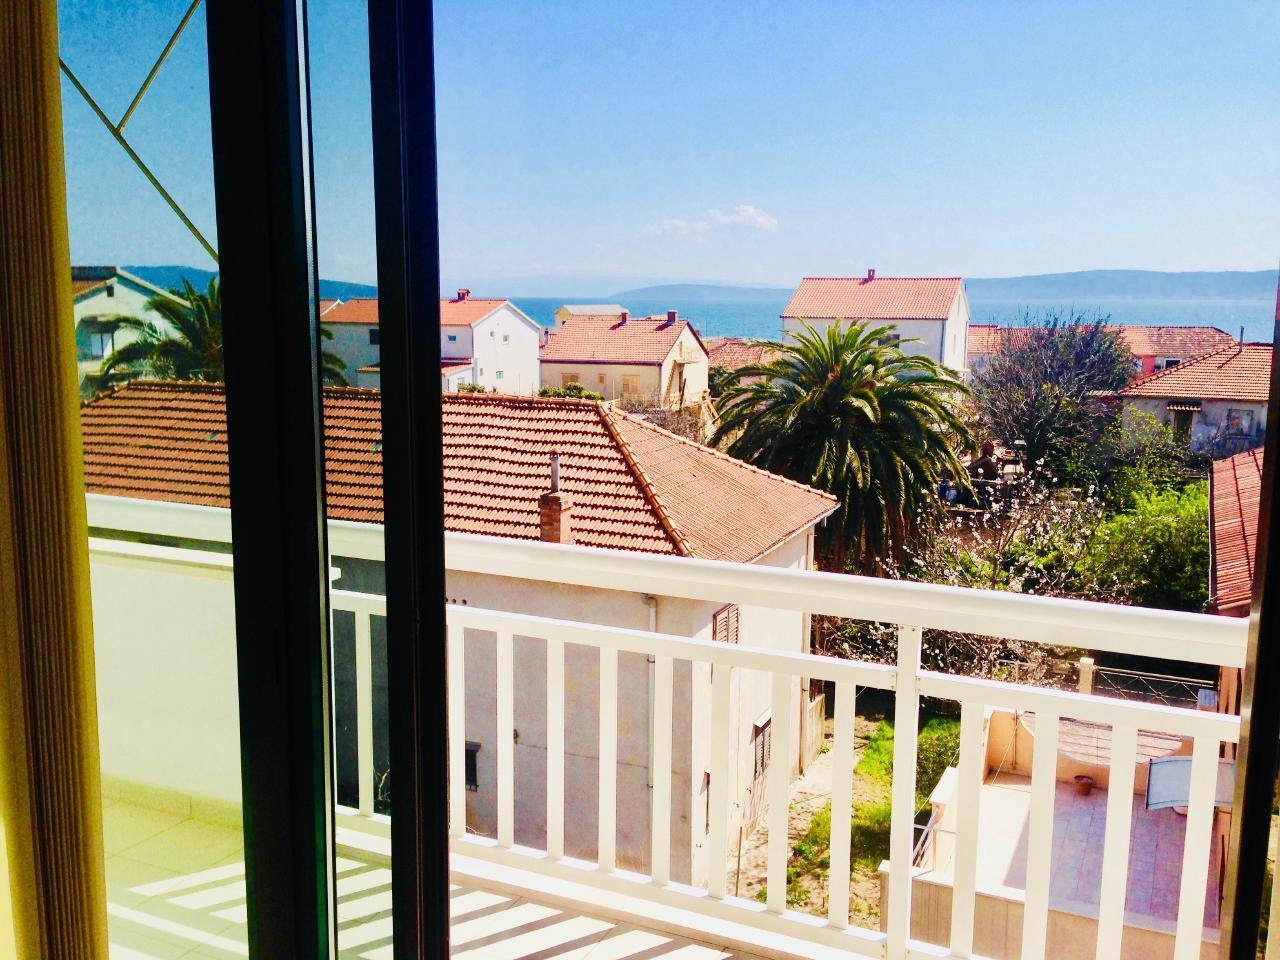 Ferienwohnung Apartmenthaus Ruza 7 - Studio (98388), Kaštel Štafilić, , Dalmatien, Kroatien, Bild 65